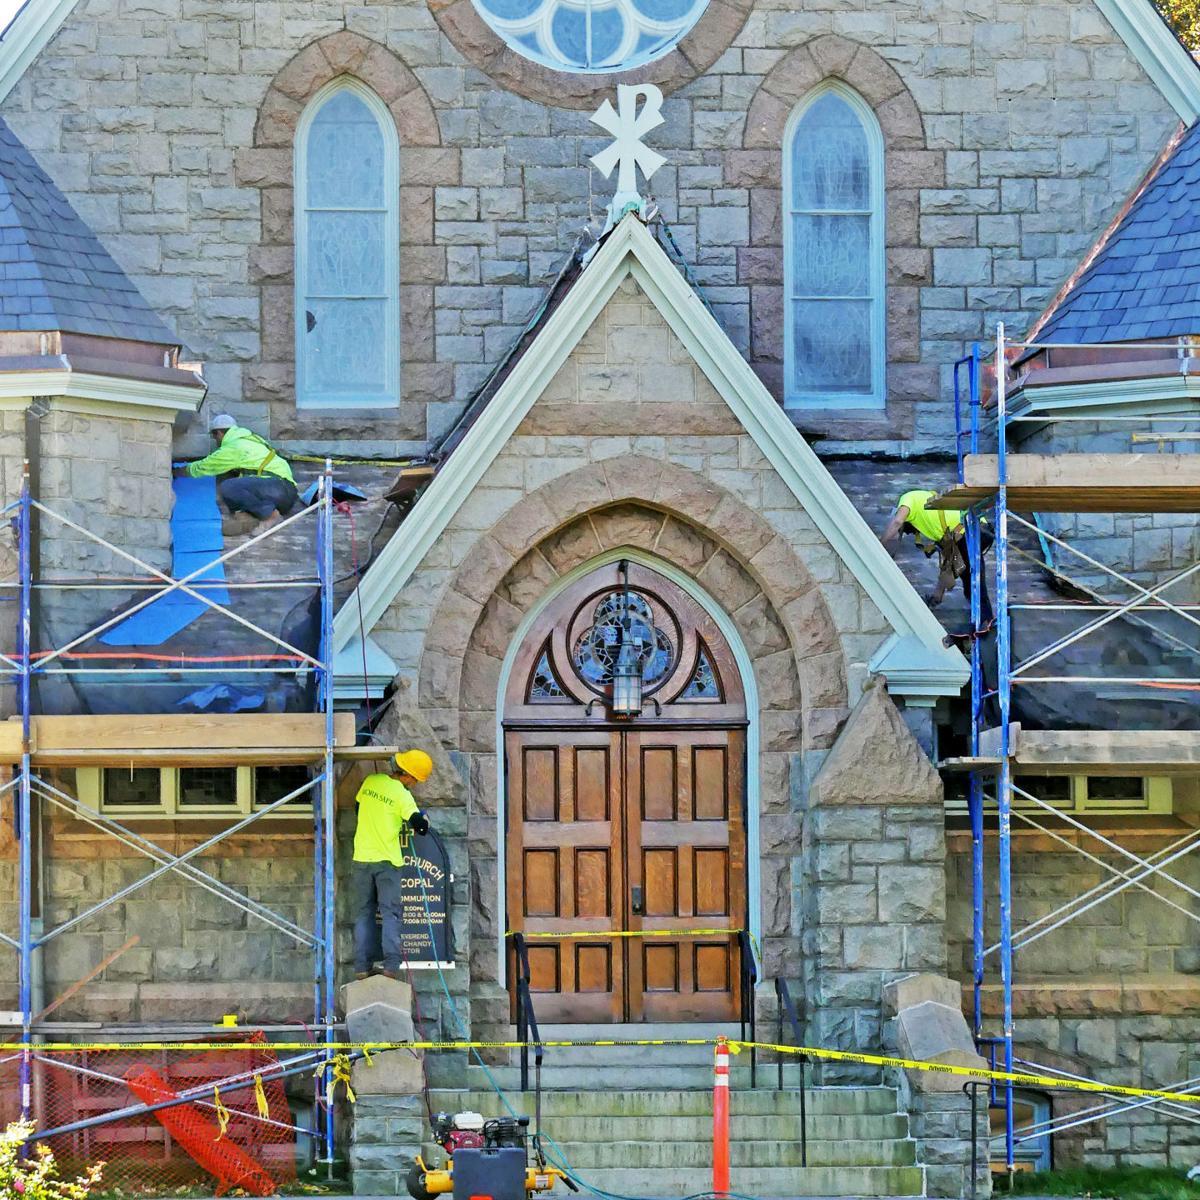 102319 WES IChrist Church roofers 328.JPG